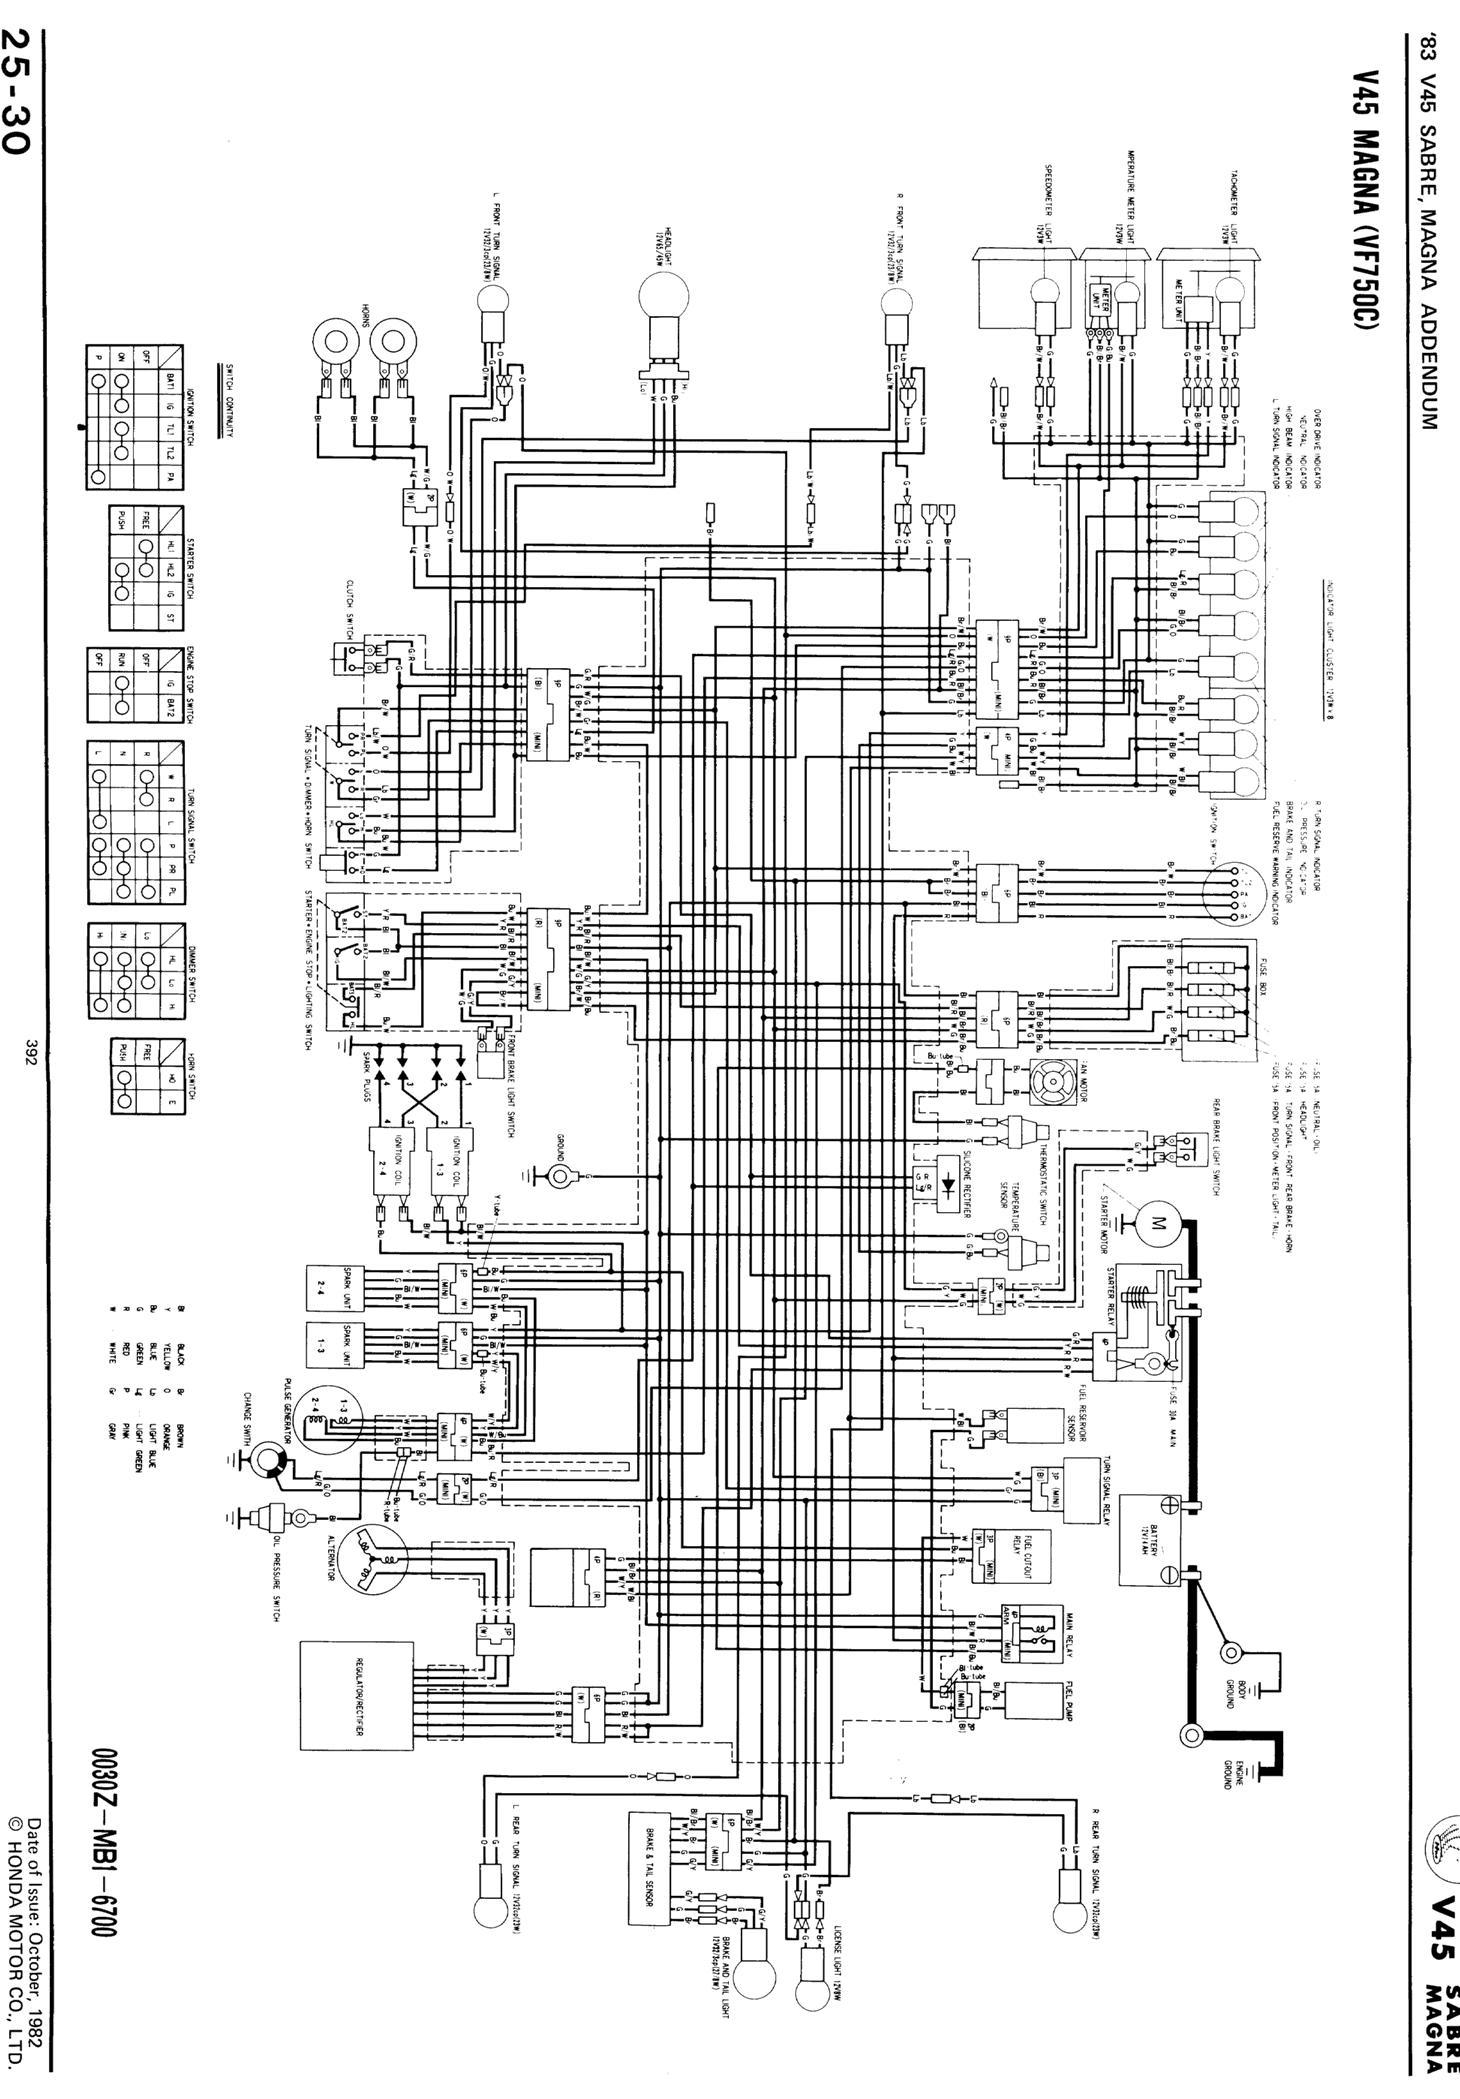 1984 honda magna v45 wiring diagram schematic